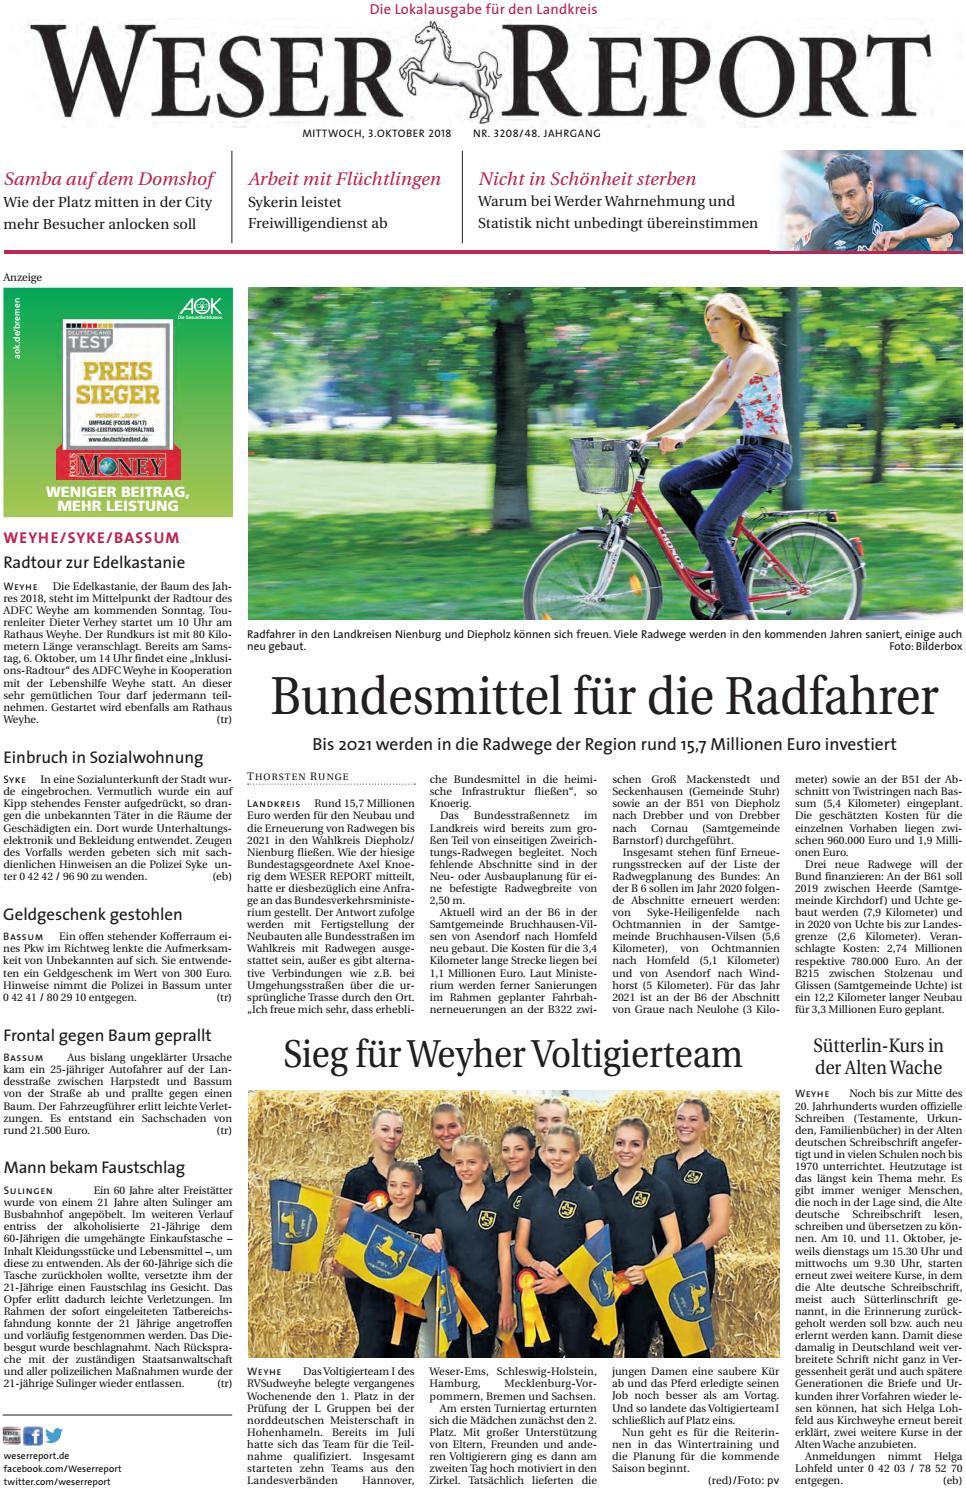 Weser Report - Weyhe, Syke, Bassum vom 03.10.2018 by KPS  Verlagsgesellschaft mbH - issuu